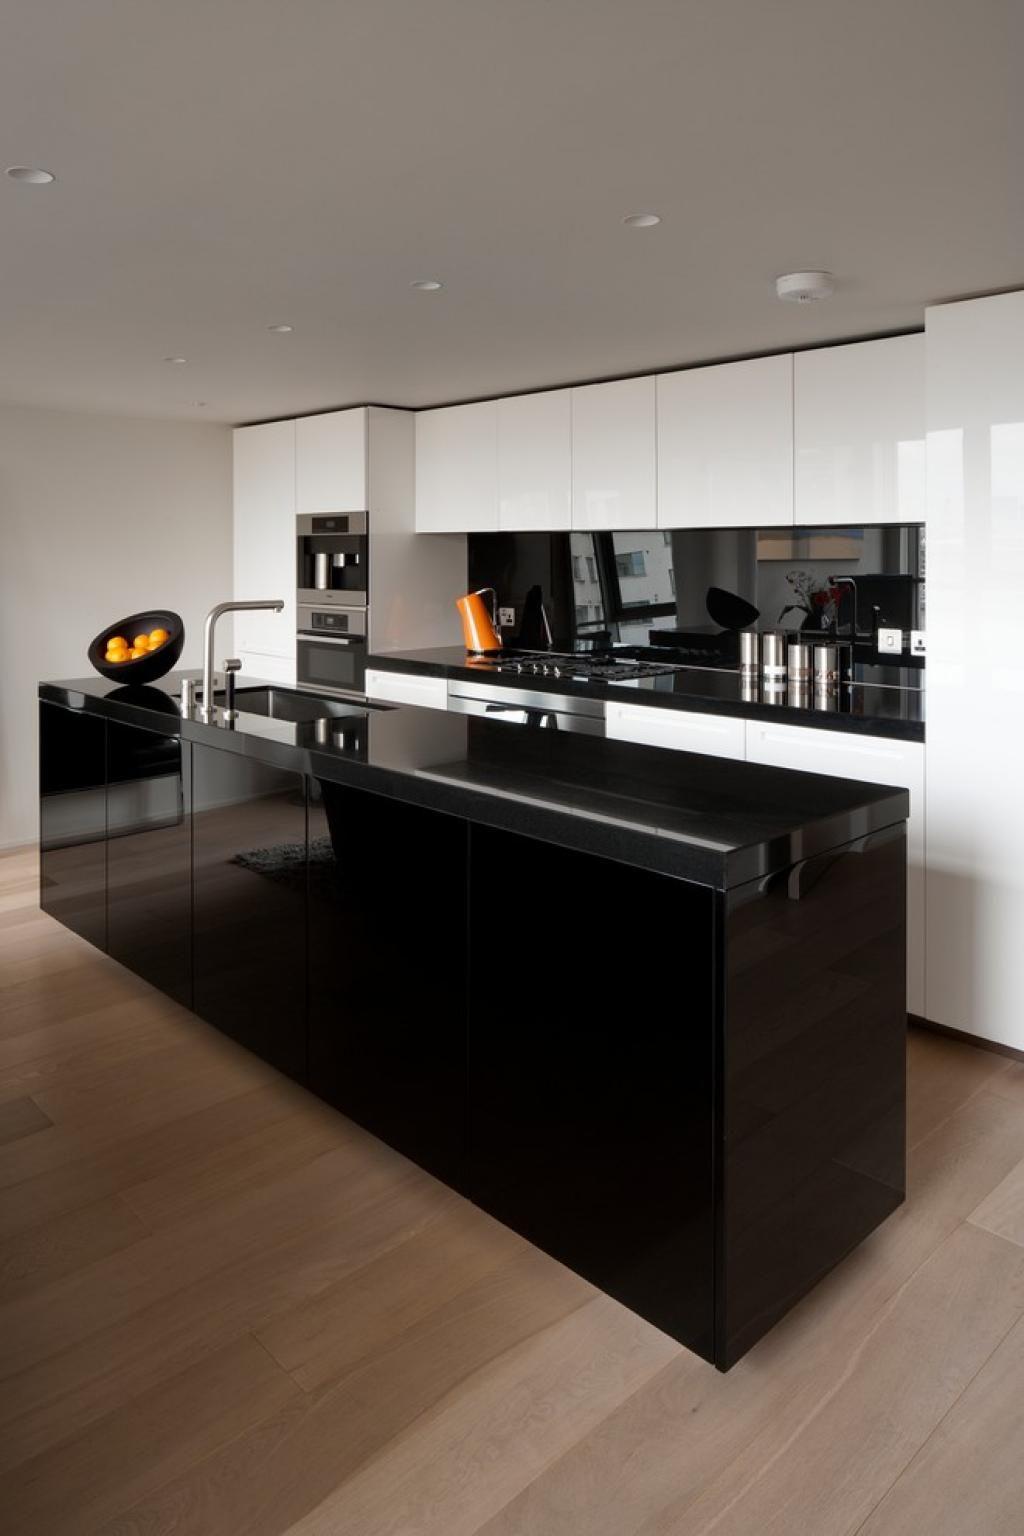 How To Design An Ultra Modern Kitchen Contemporary Kitchen